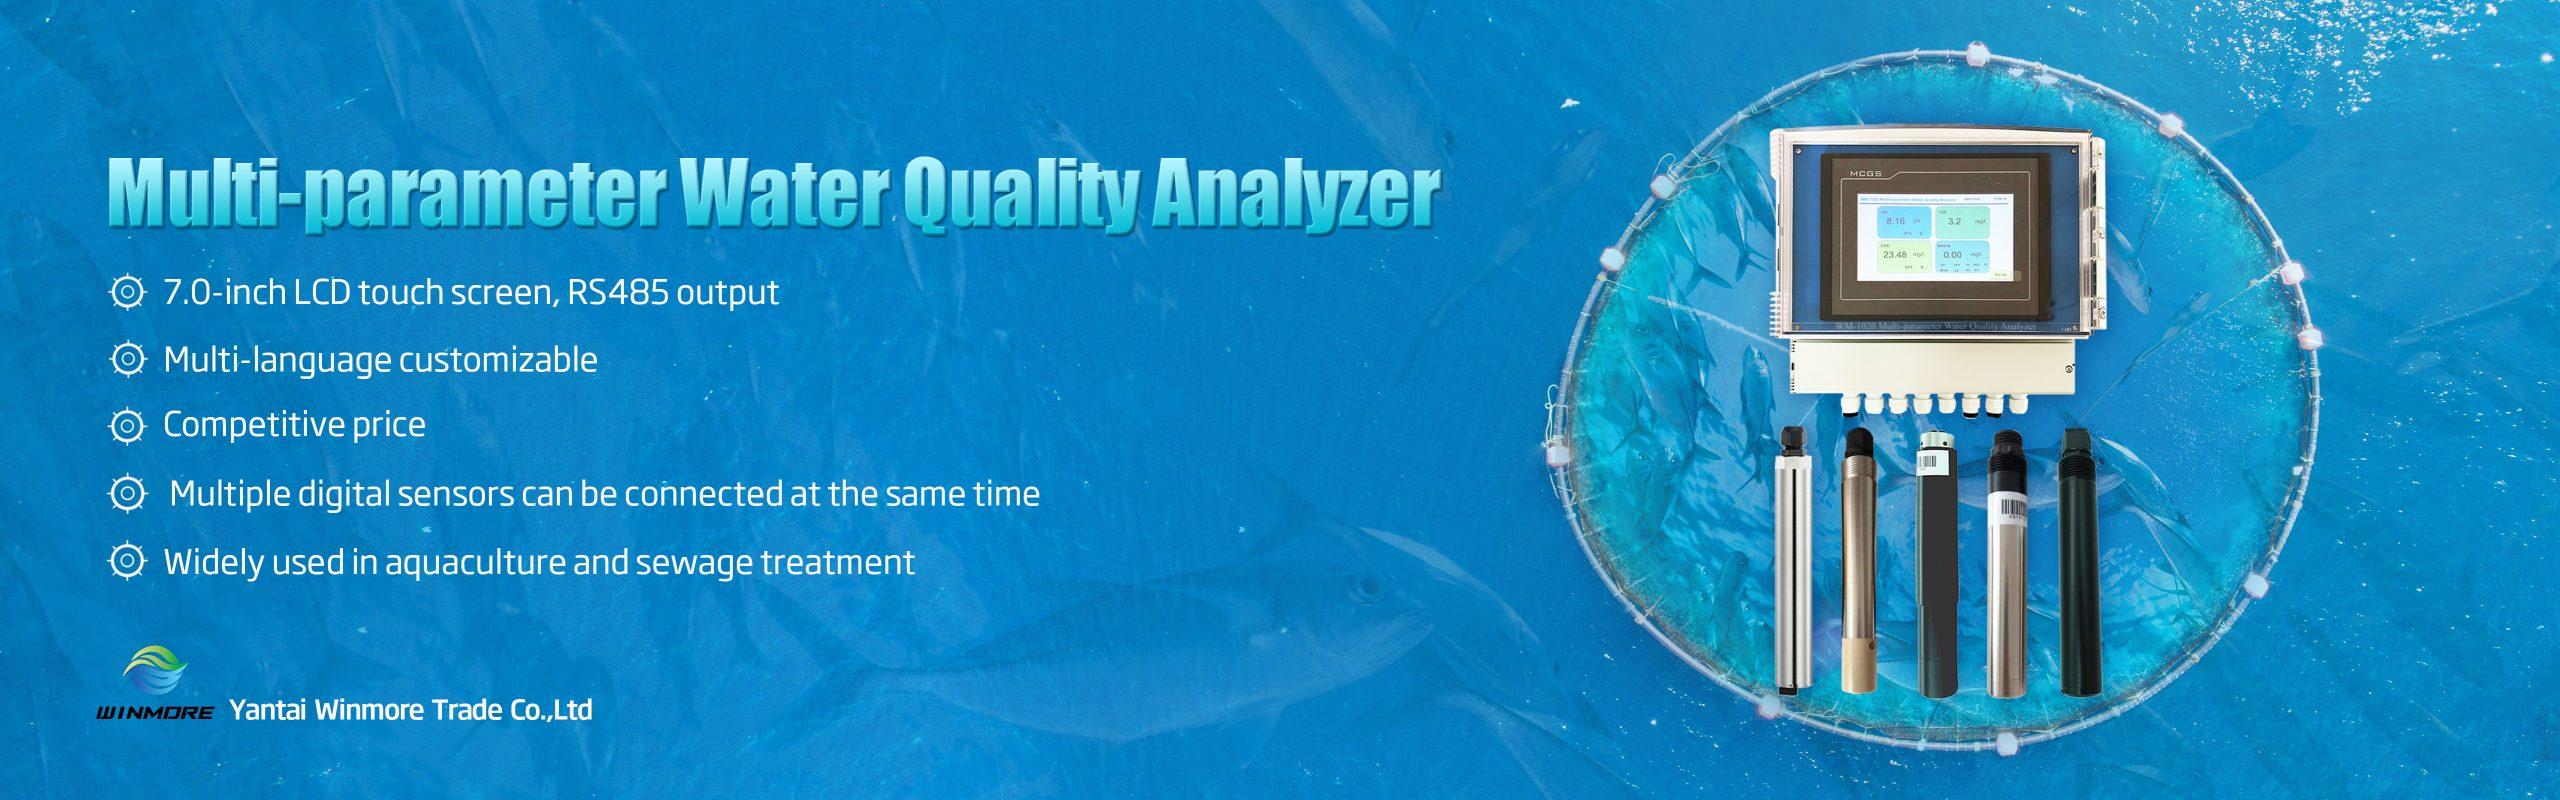 Multi-parameter Water Quality Analyzer